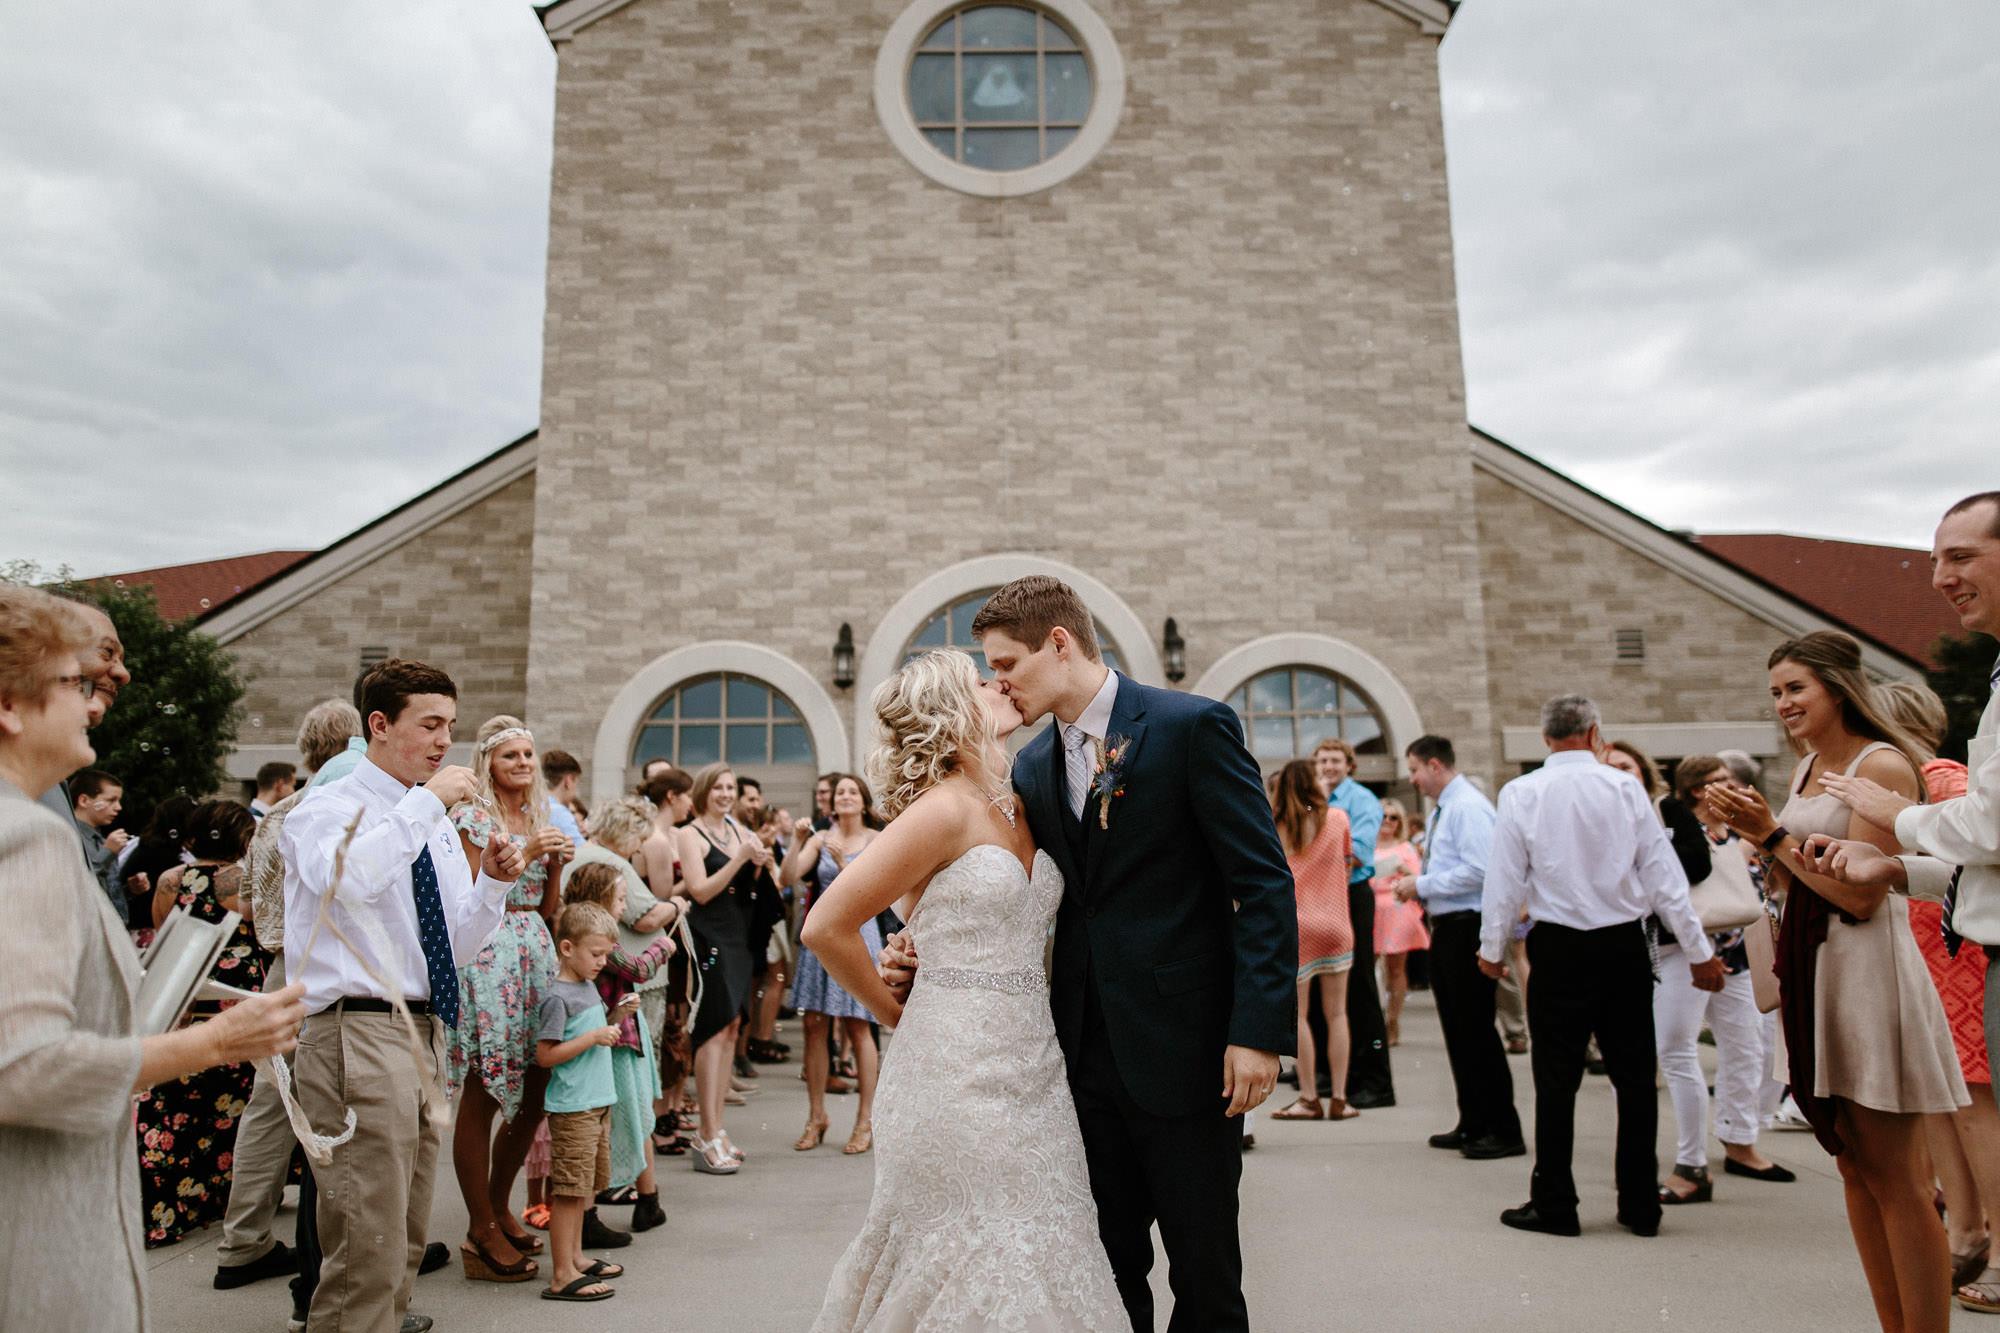 meadow-barn-wedding-sioux-falls-south-dakota-romantic-adventerous-michael-liedtke-photography039.jpg